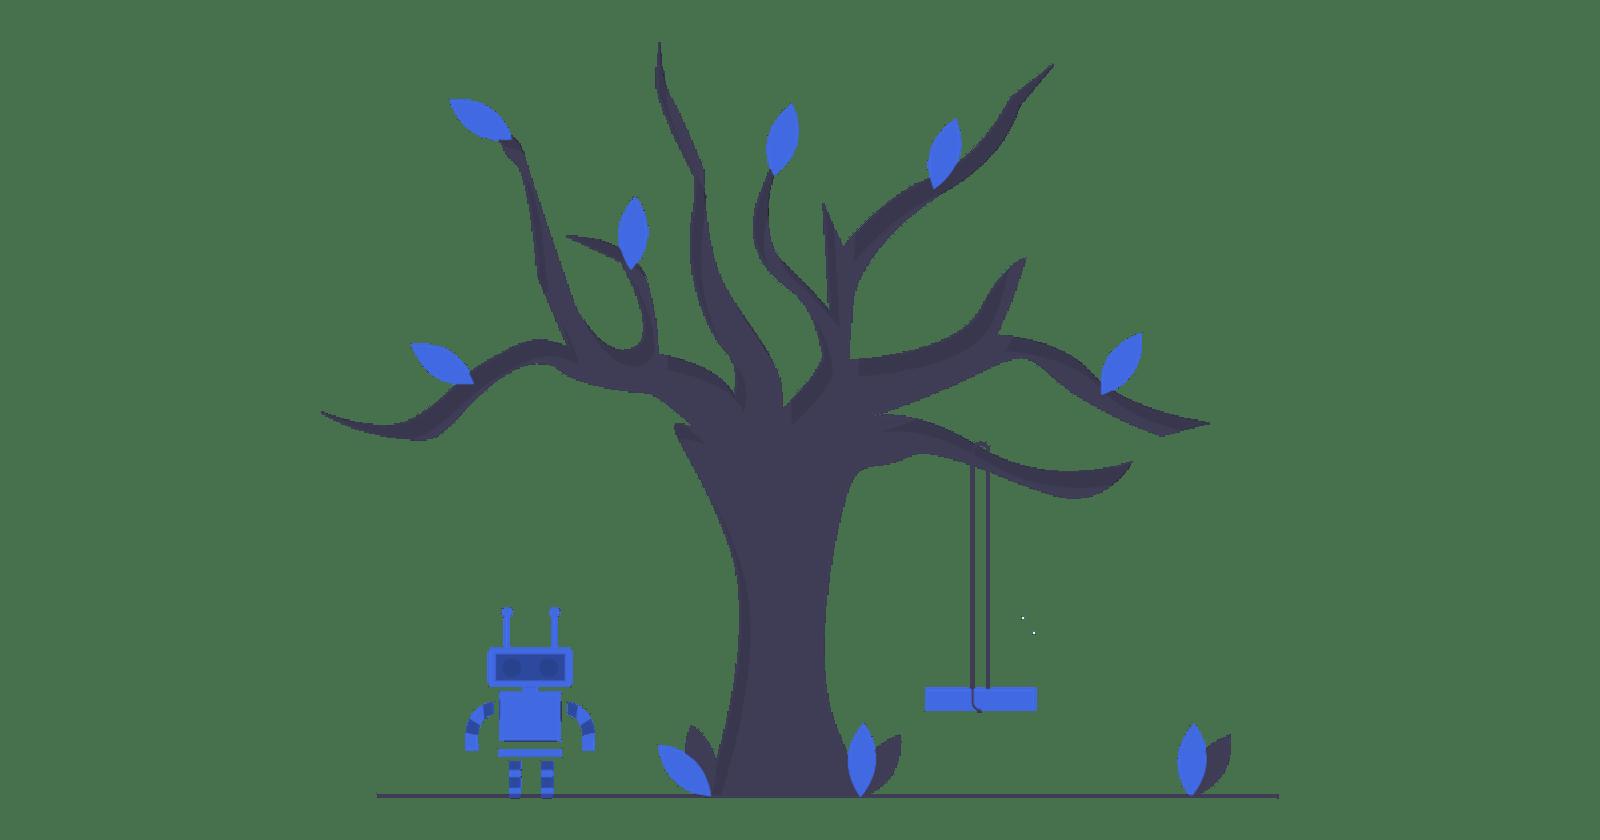 ISLR Chapter 8—Tree-Based Methods